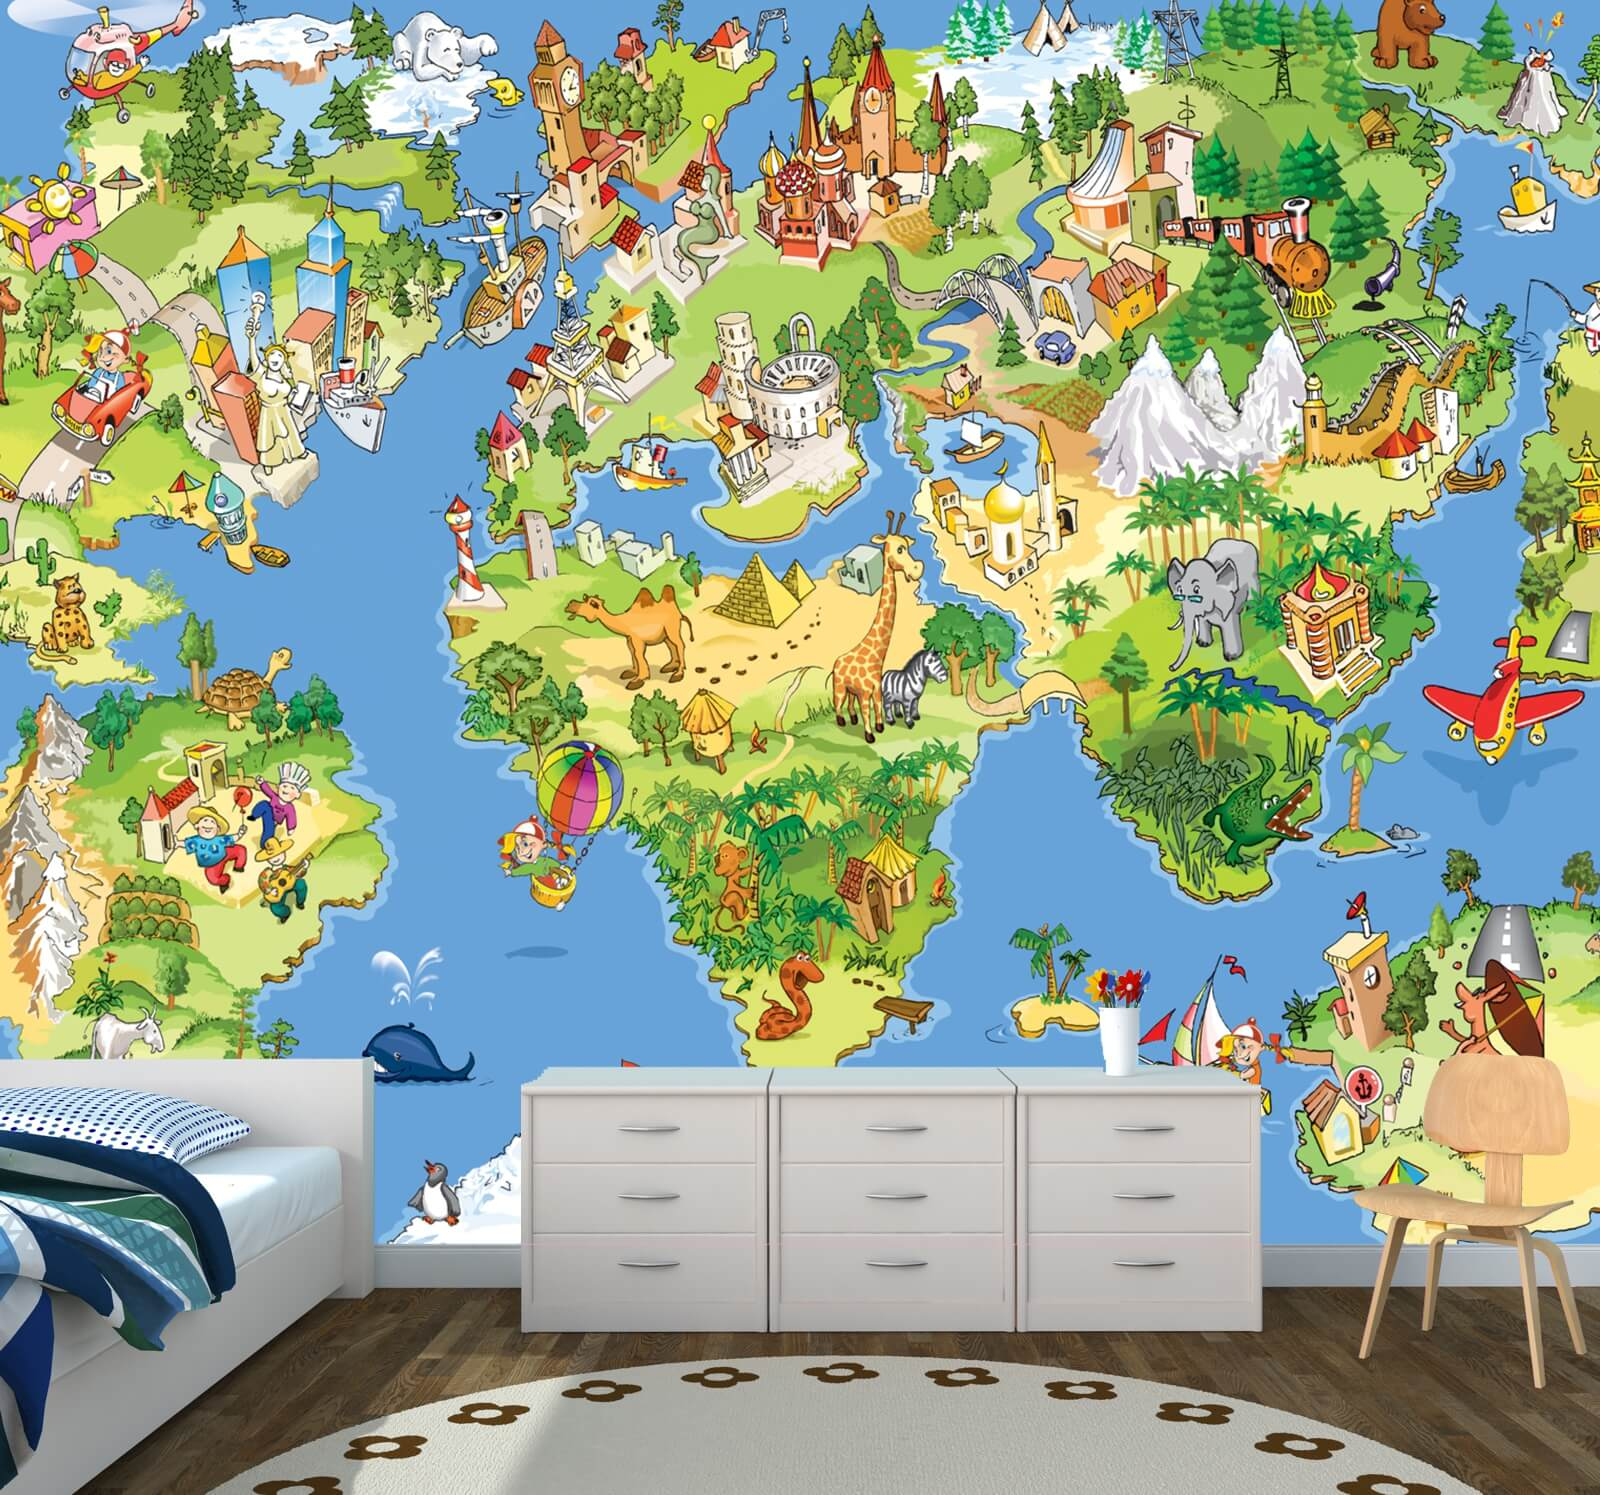 Vlies XXL-Poster Fototapete Kindertapete Kinder Weltkarte Landkarte